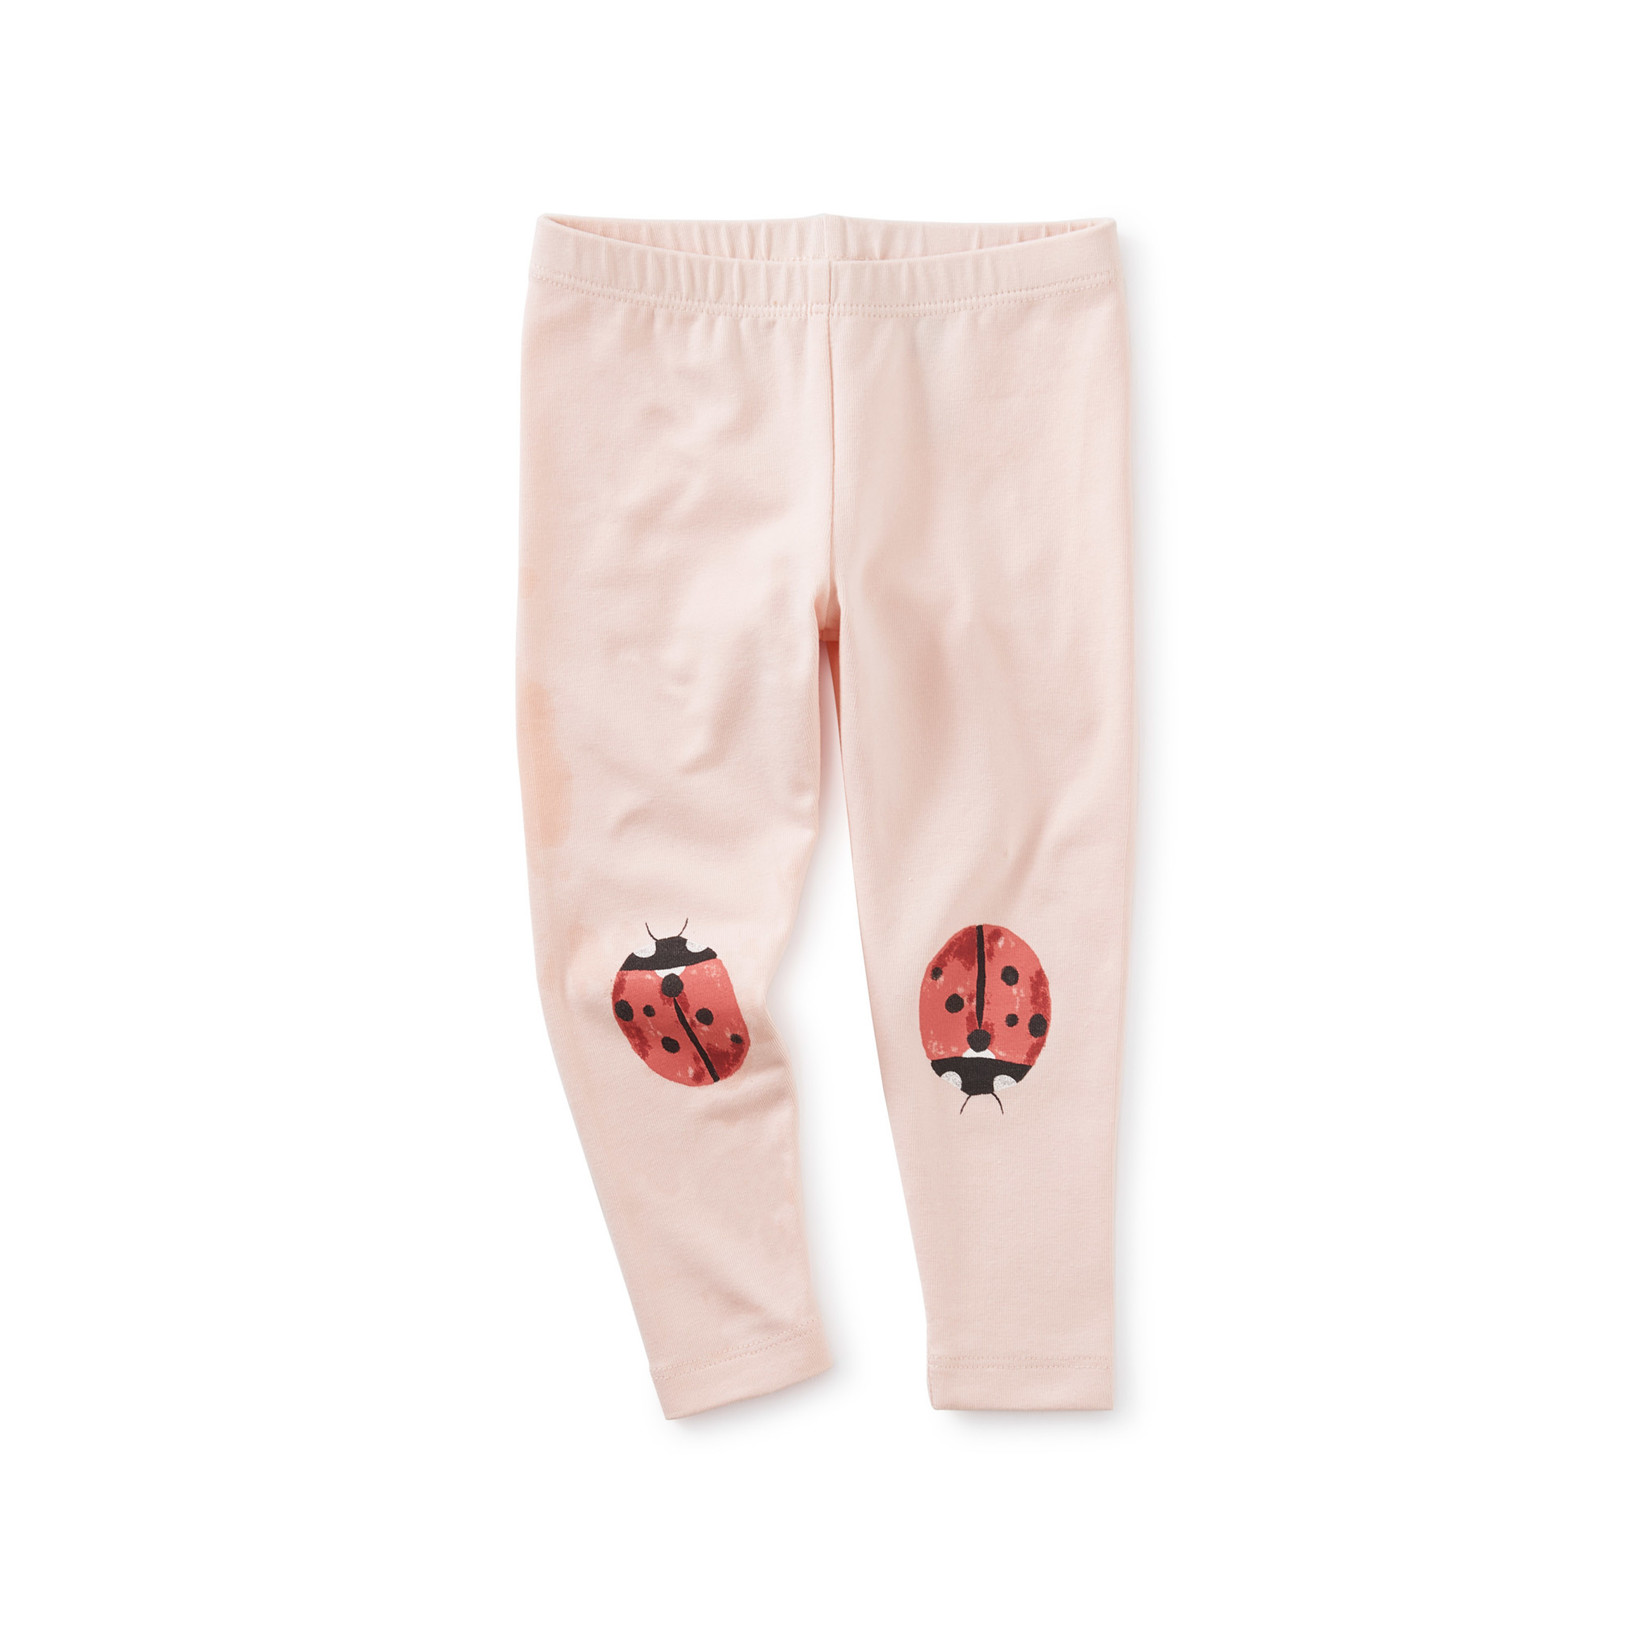 Tea Collection Ladybug Baby Leggings - Pink Salt